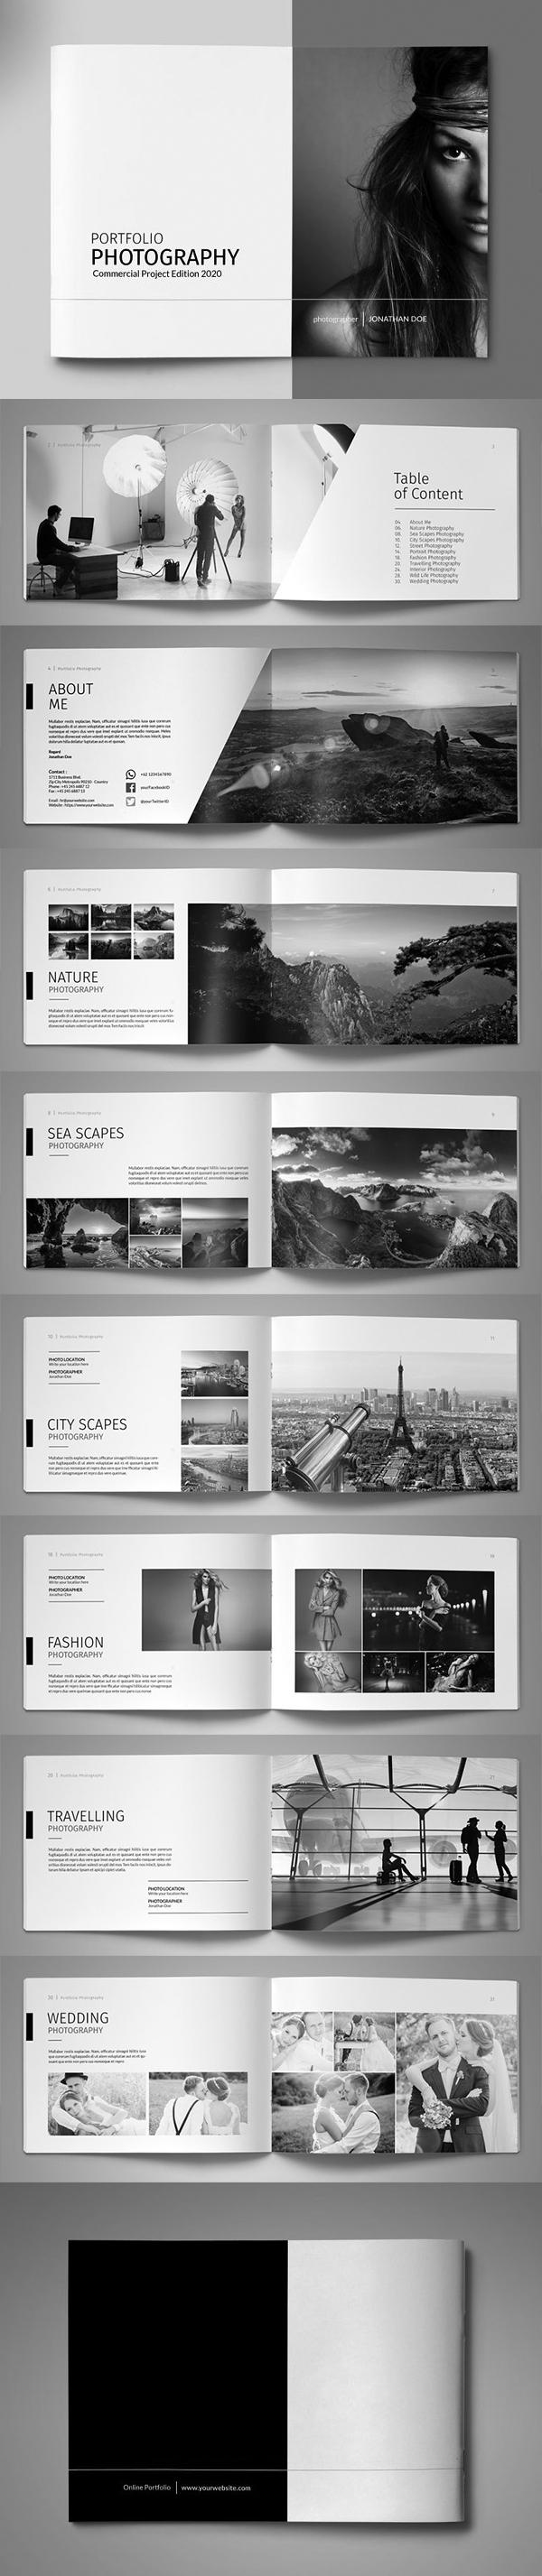 A5 Photography Portfolio Brochure Template